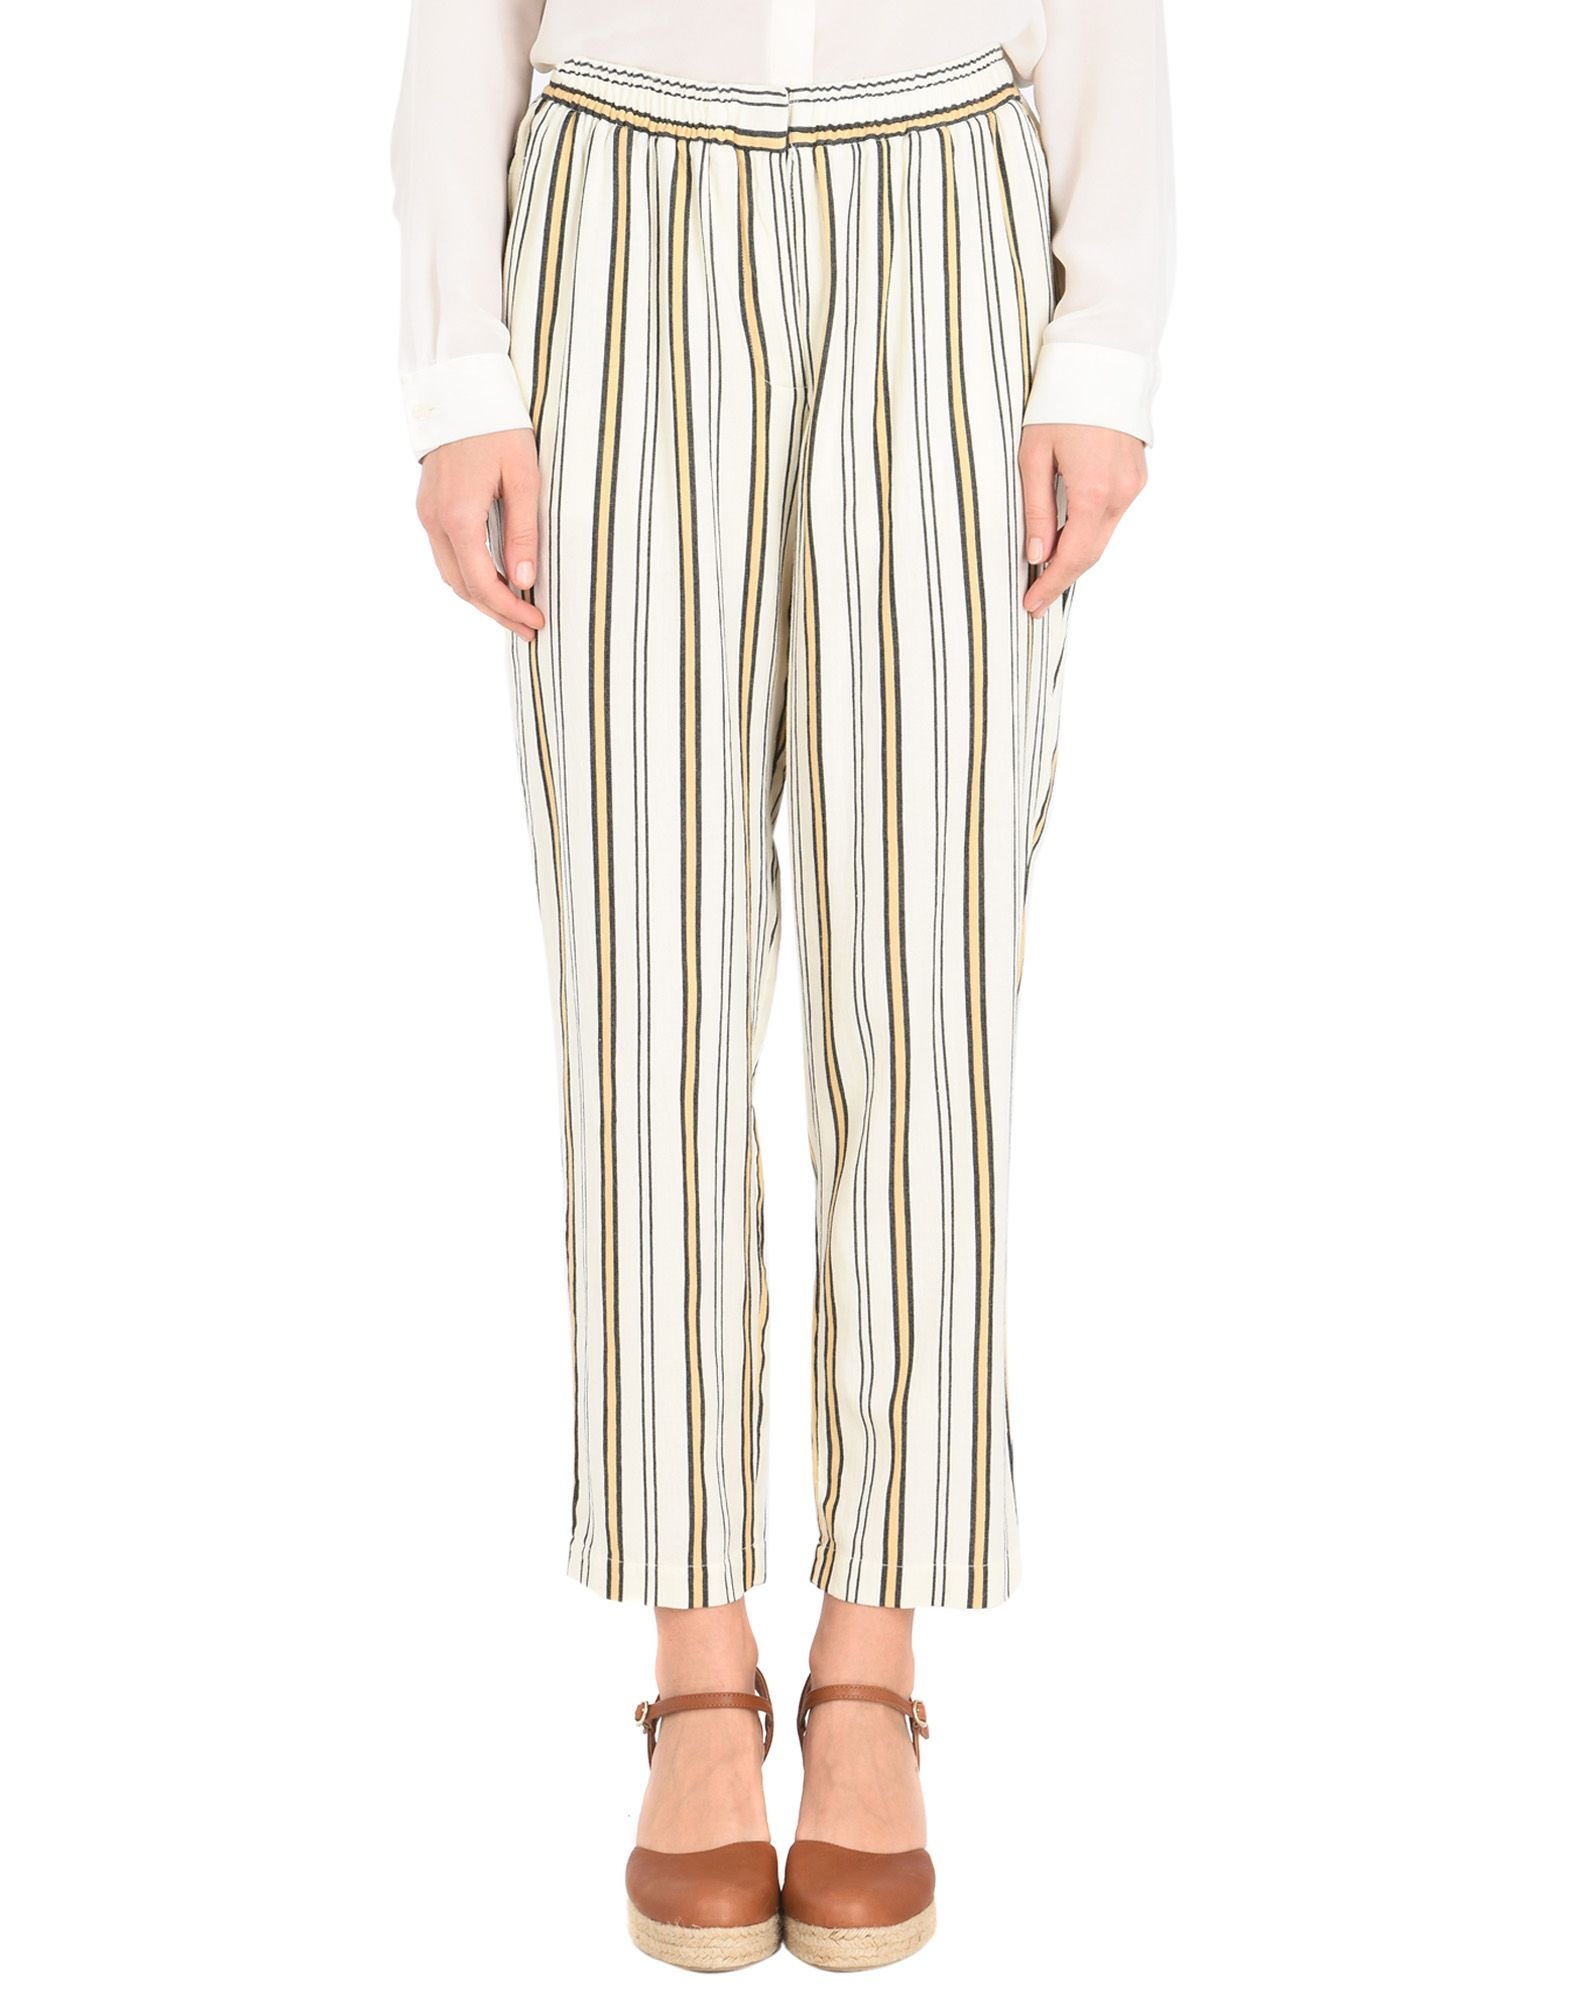 Pantalone Designers Designers Designers Society donna - 13174380GU e5c